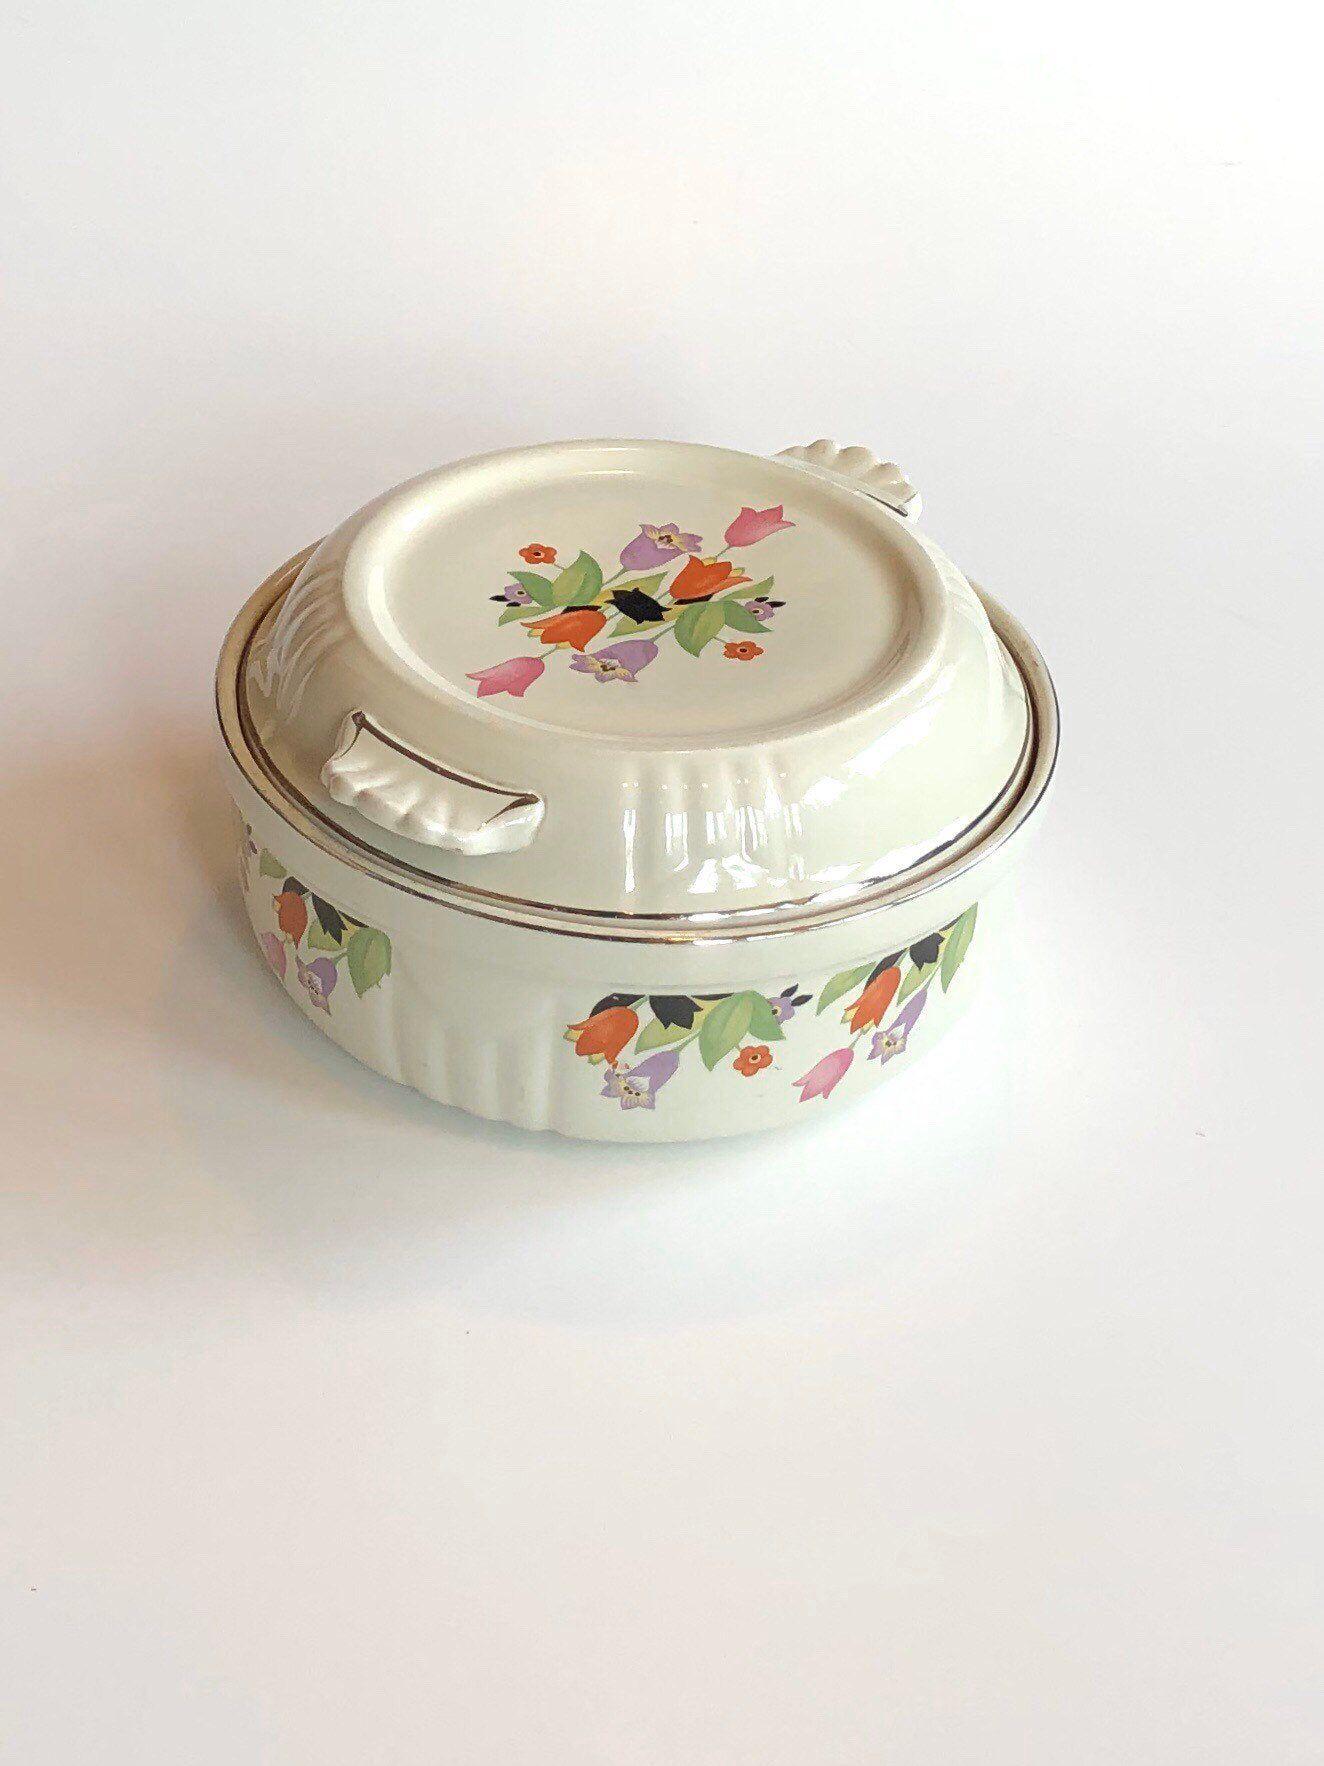 Vintage Halls Superior Quality Kitchen Ware Crocus Pattern Etsy Vintage Baking Casserole Dishes Baked Dishes